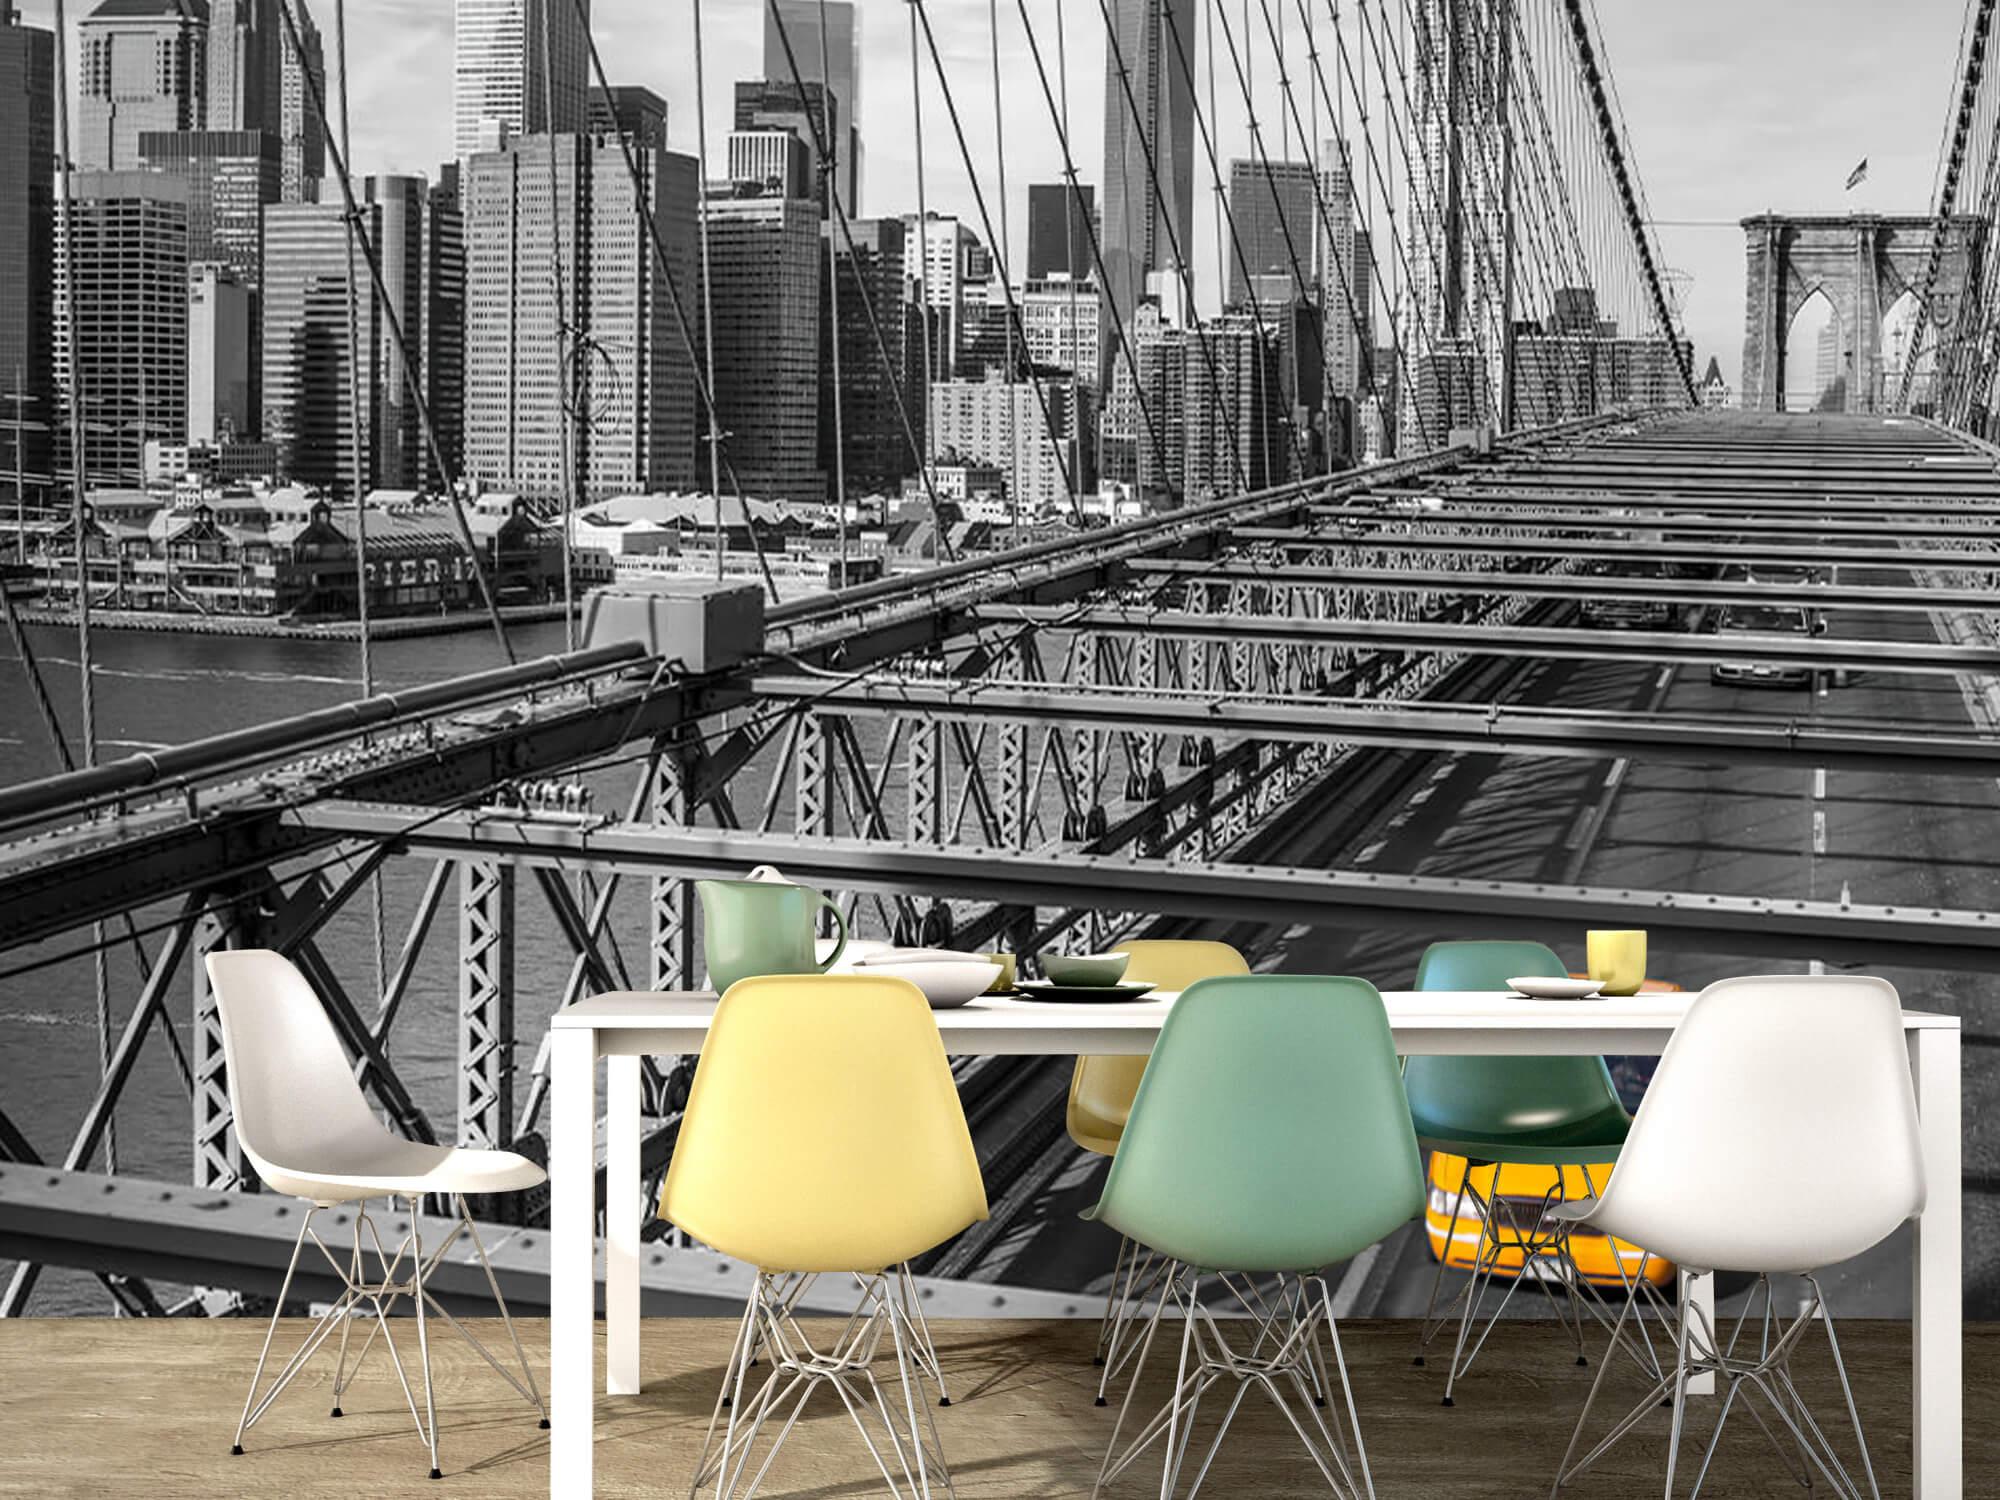 En taxi över Brooklyn Bridge 14